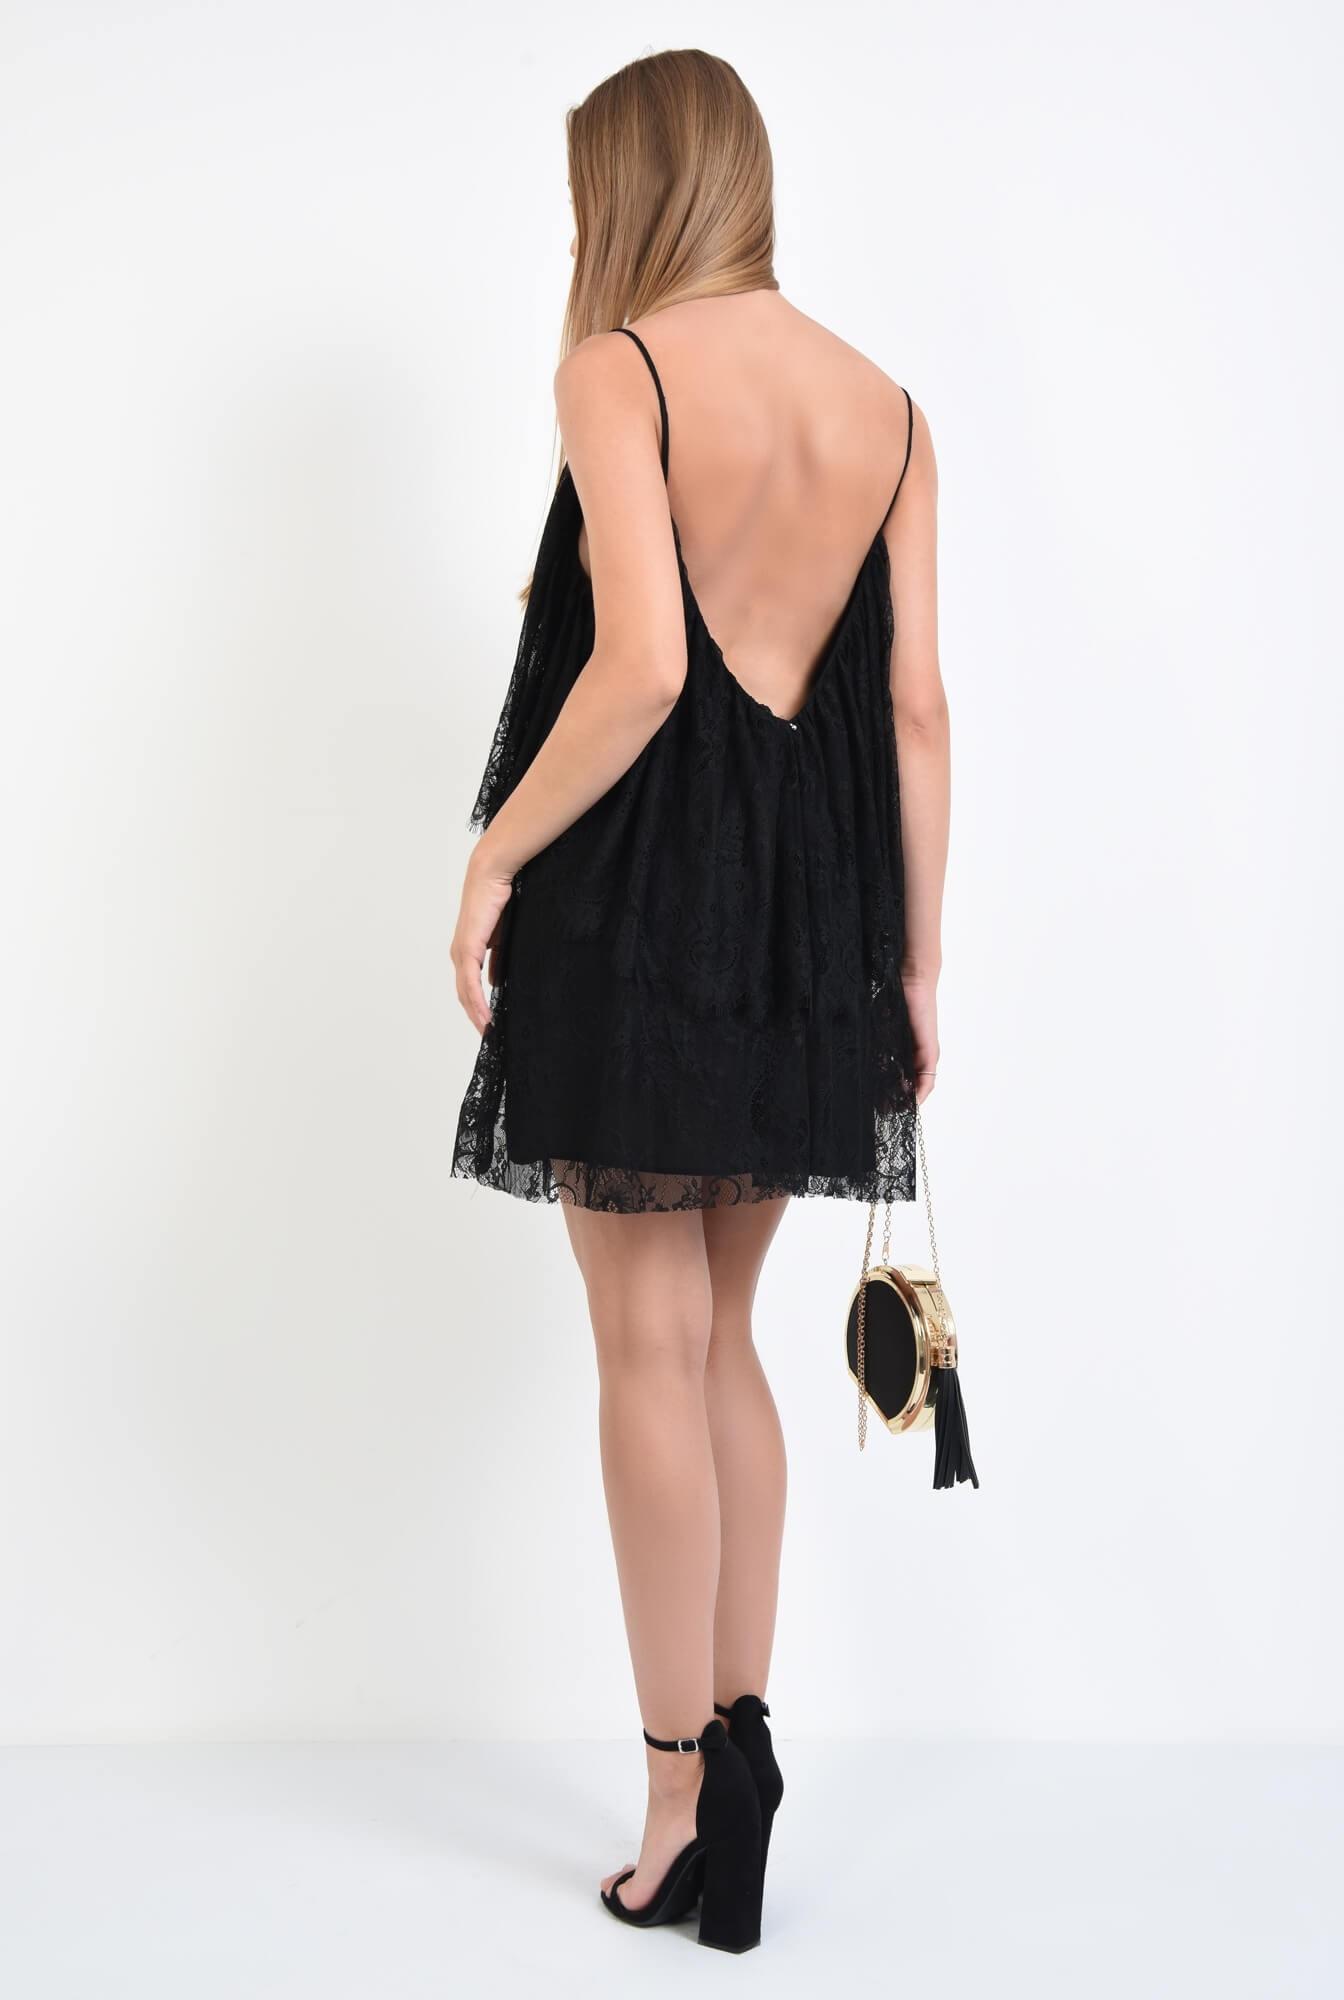 1 - rochie de seara, scurta, din dantela, negru, bretele subtiri